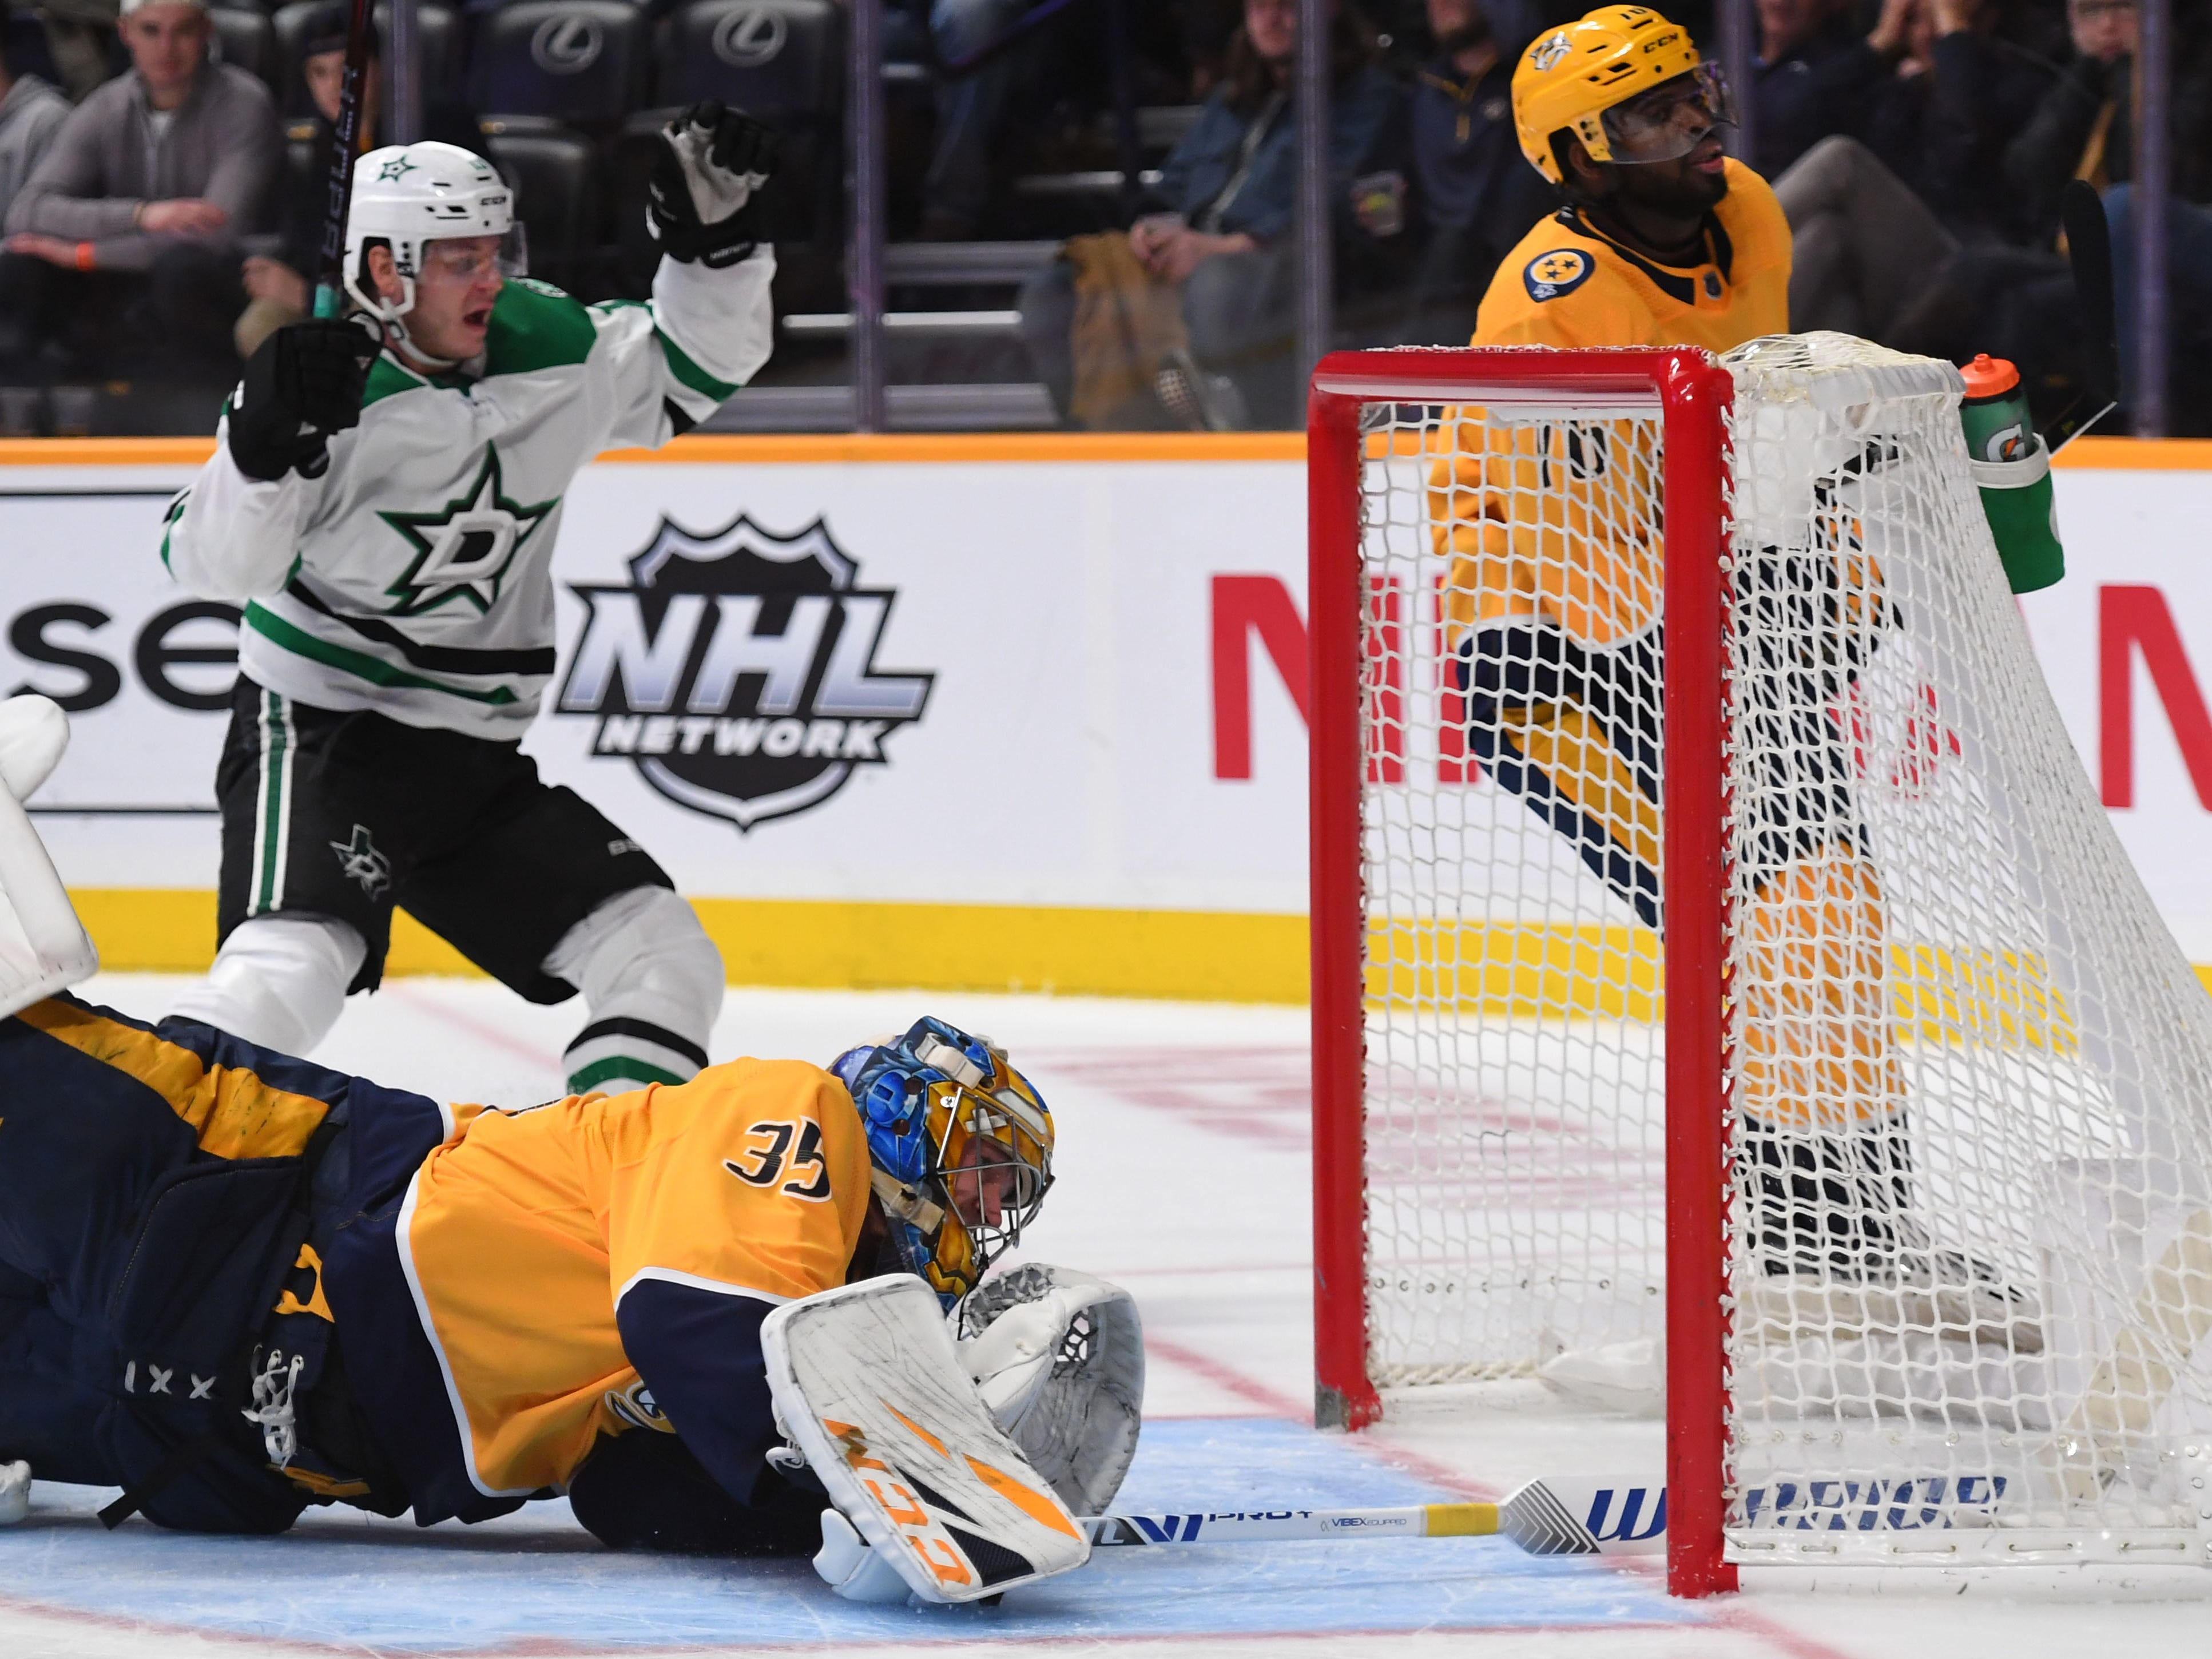 Dec. 27: Nashville Predators goaltender Pekka Rinne is unable to stop a slap shot from Dallas Stars center Mattias Janmark as it slides into the net